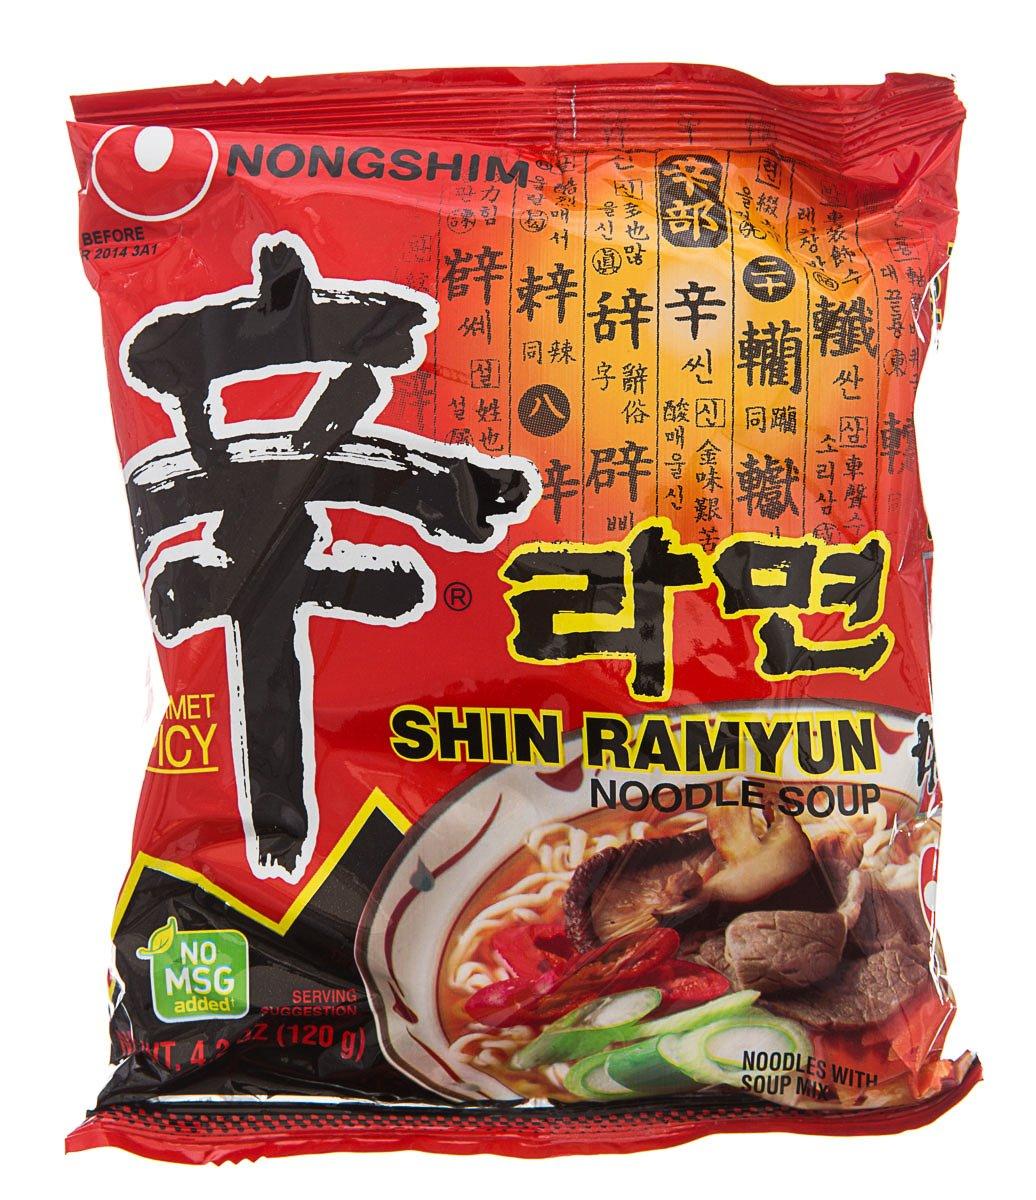 Nong Shim Shin Ramyun Noodle Soup, Gourmet Spicy Flavor, 4.23-Ounce (Pack of 10) by Nong Shim